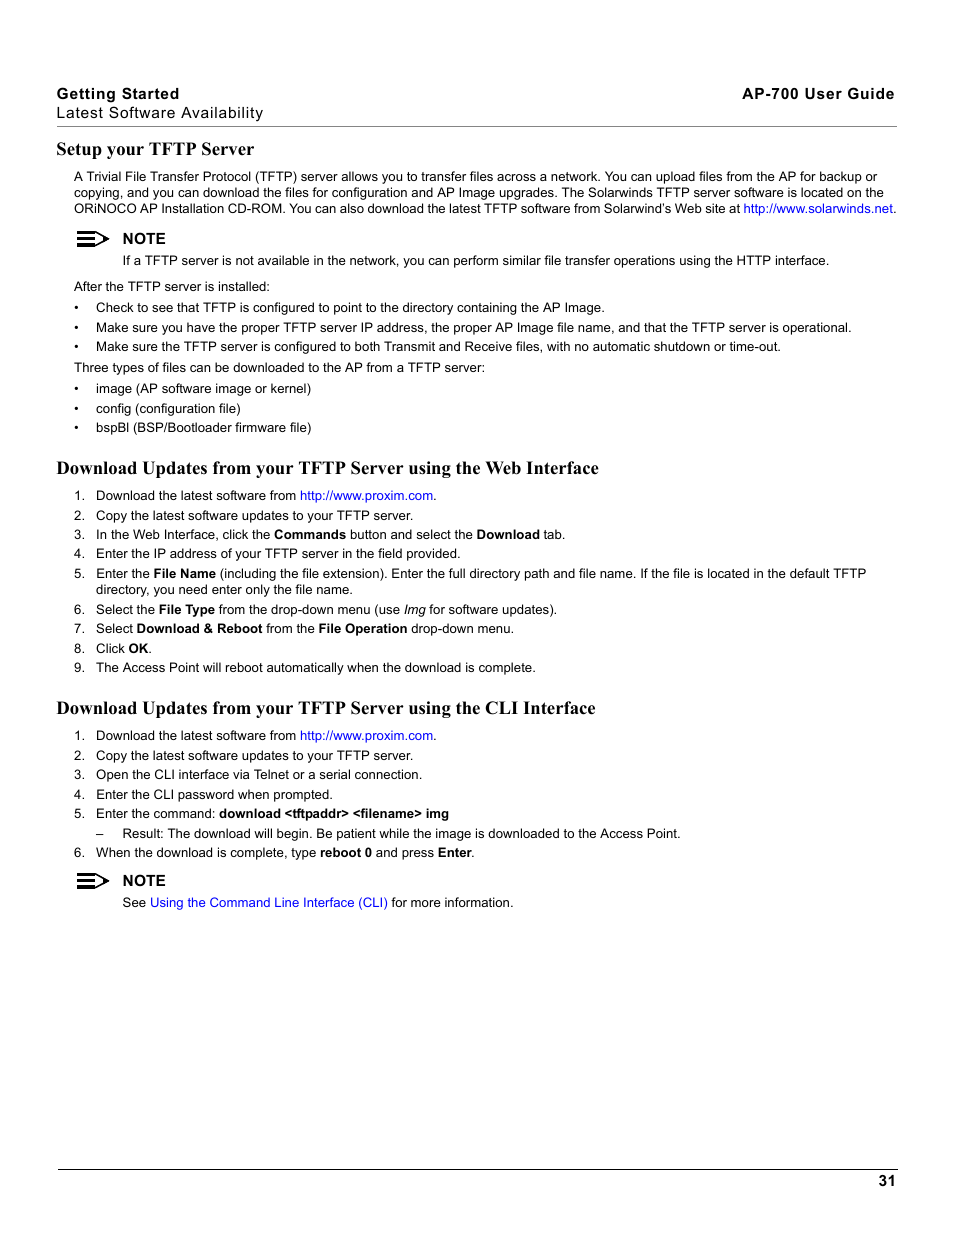 Setup your tftp server | Proxim ORiNOCO AP-700 User Manual